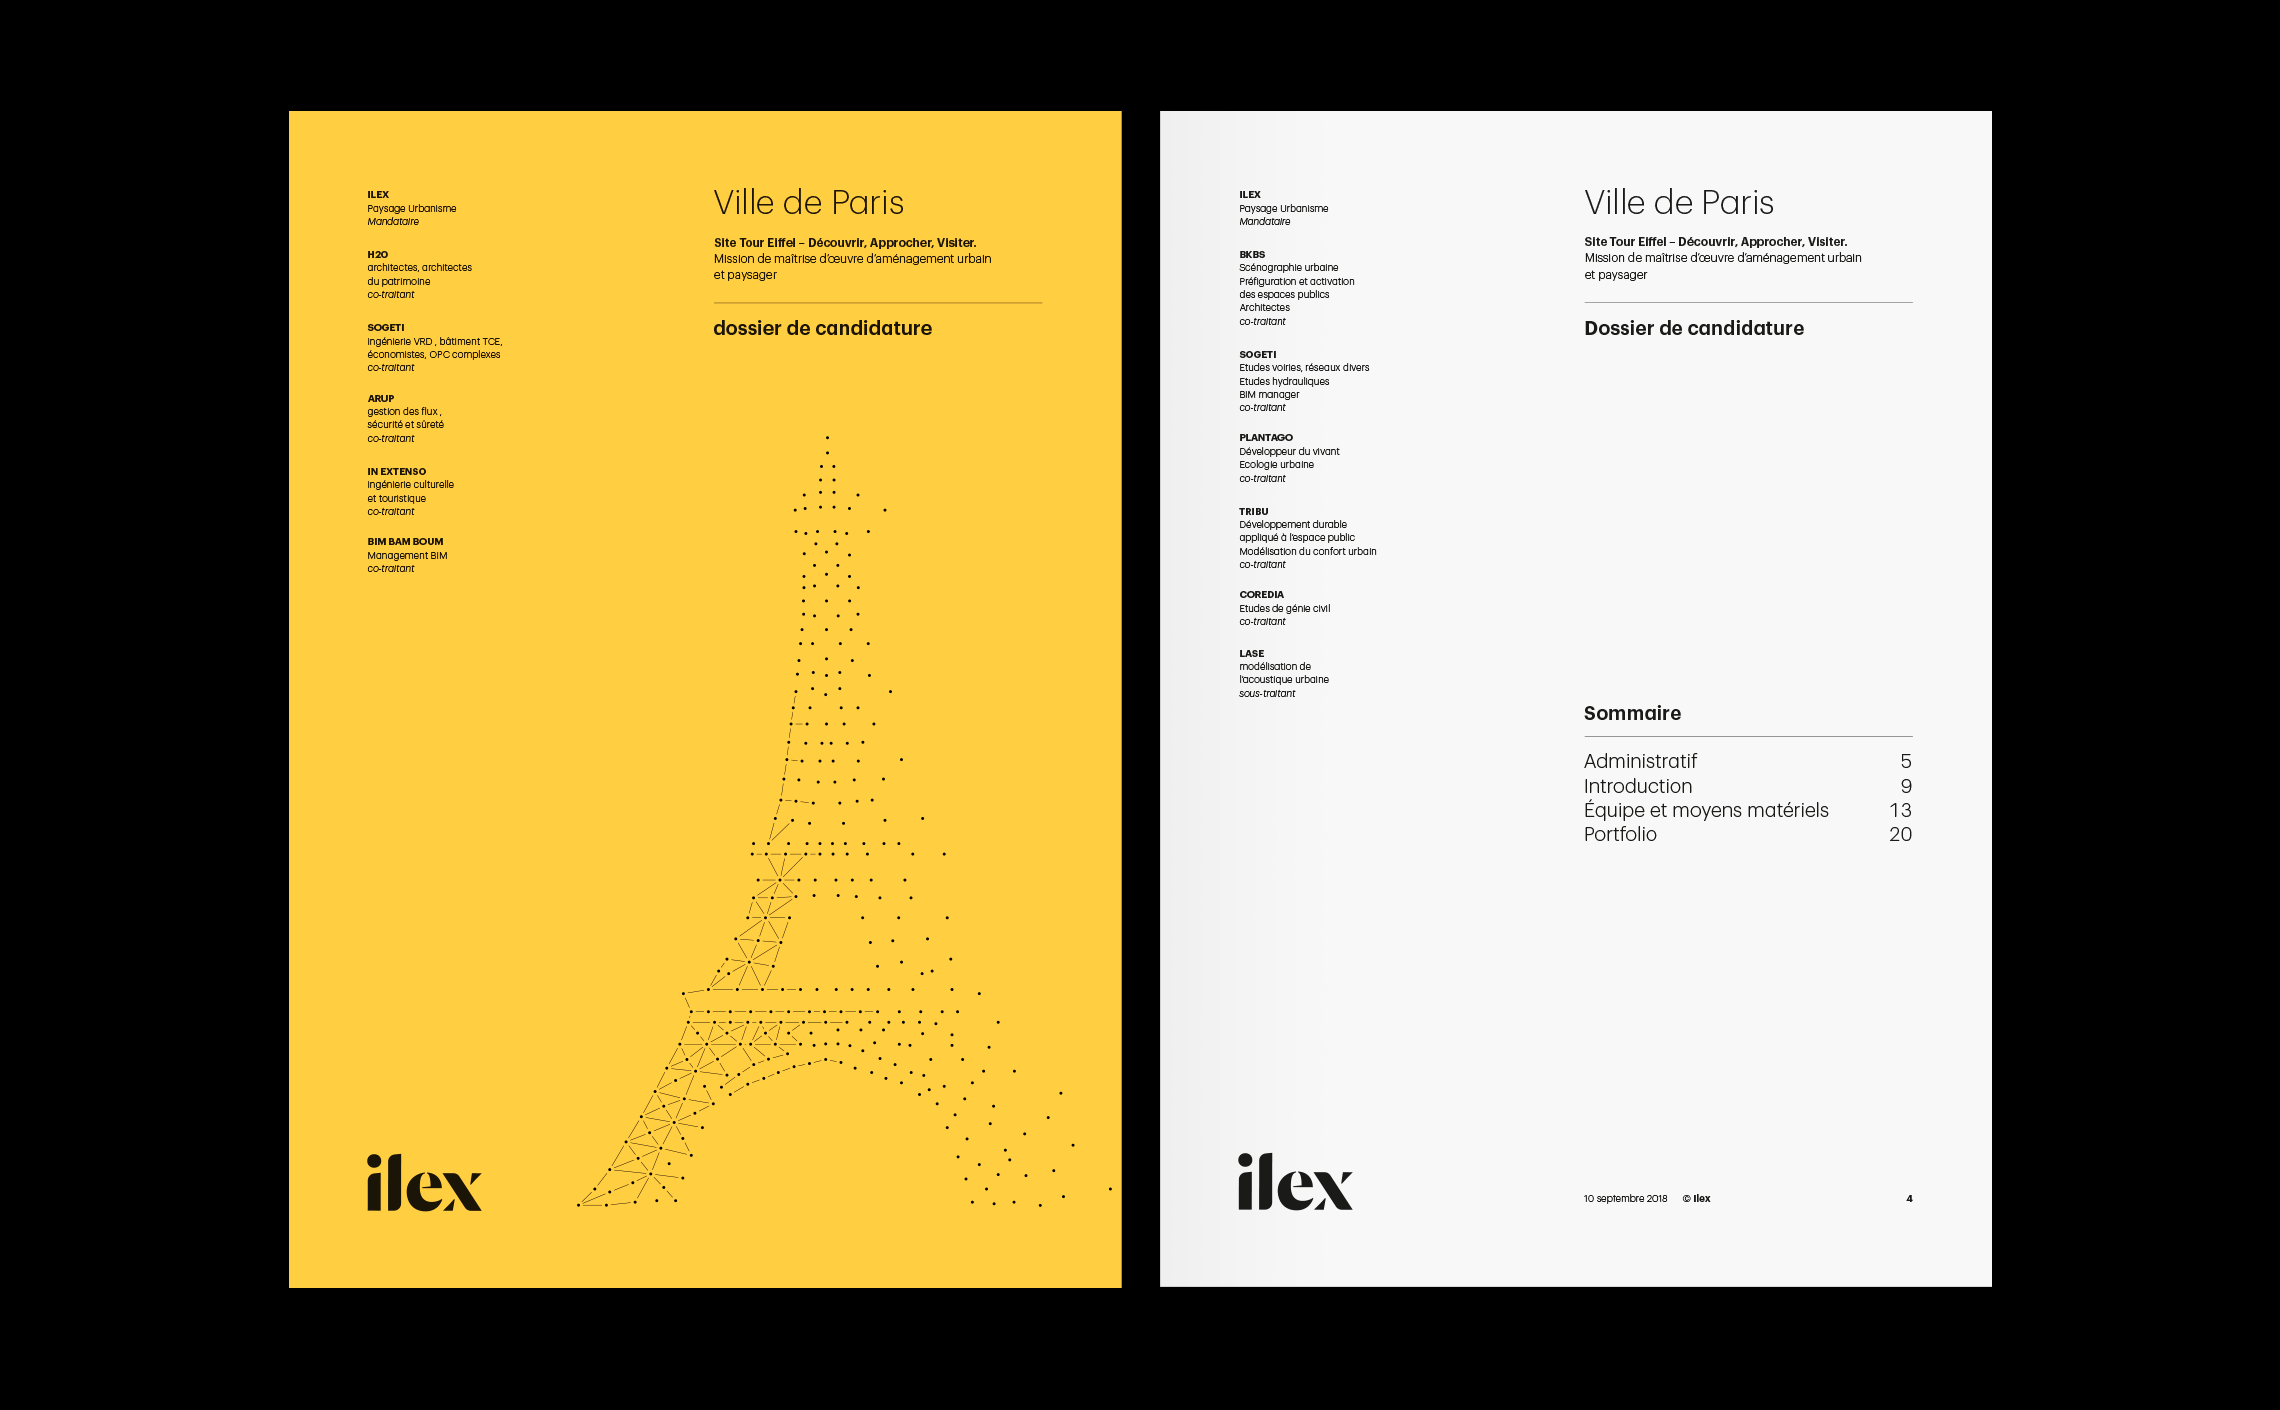 Ilex-images-web08